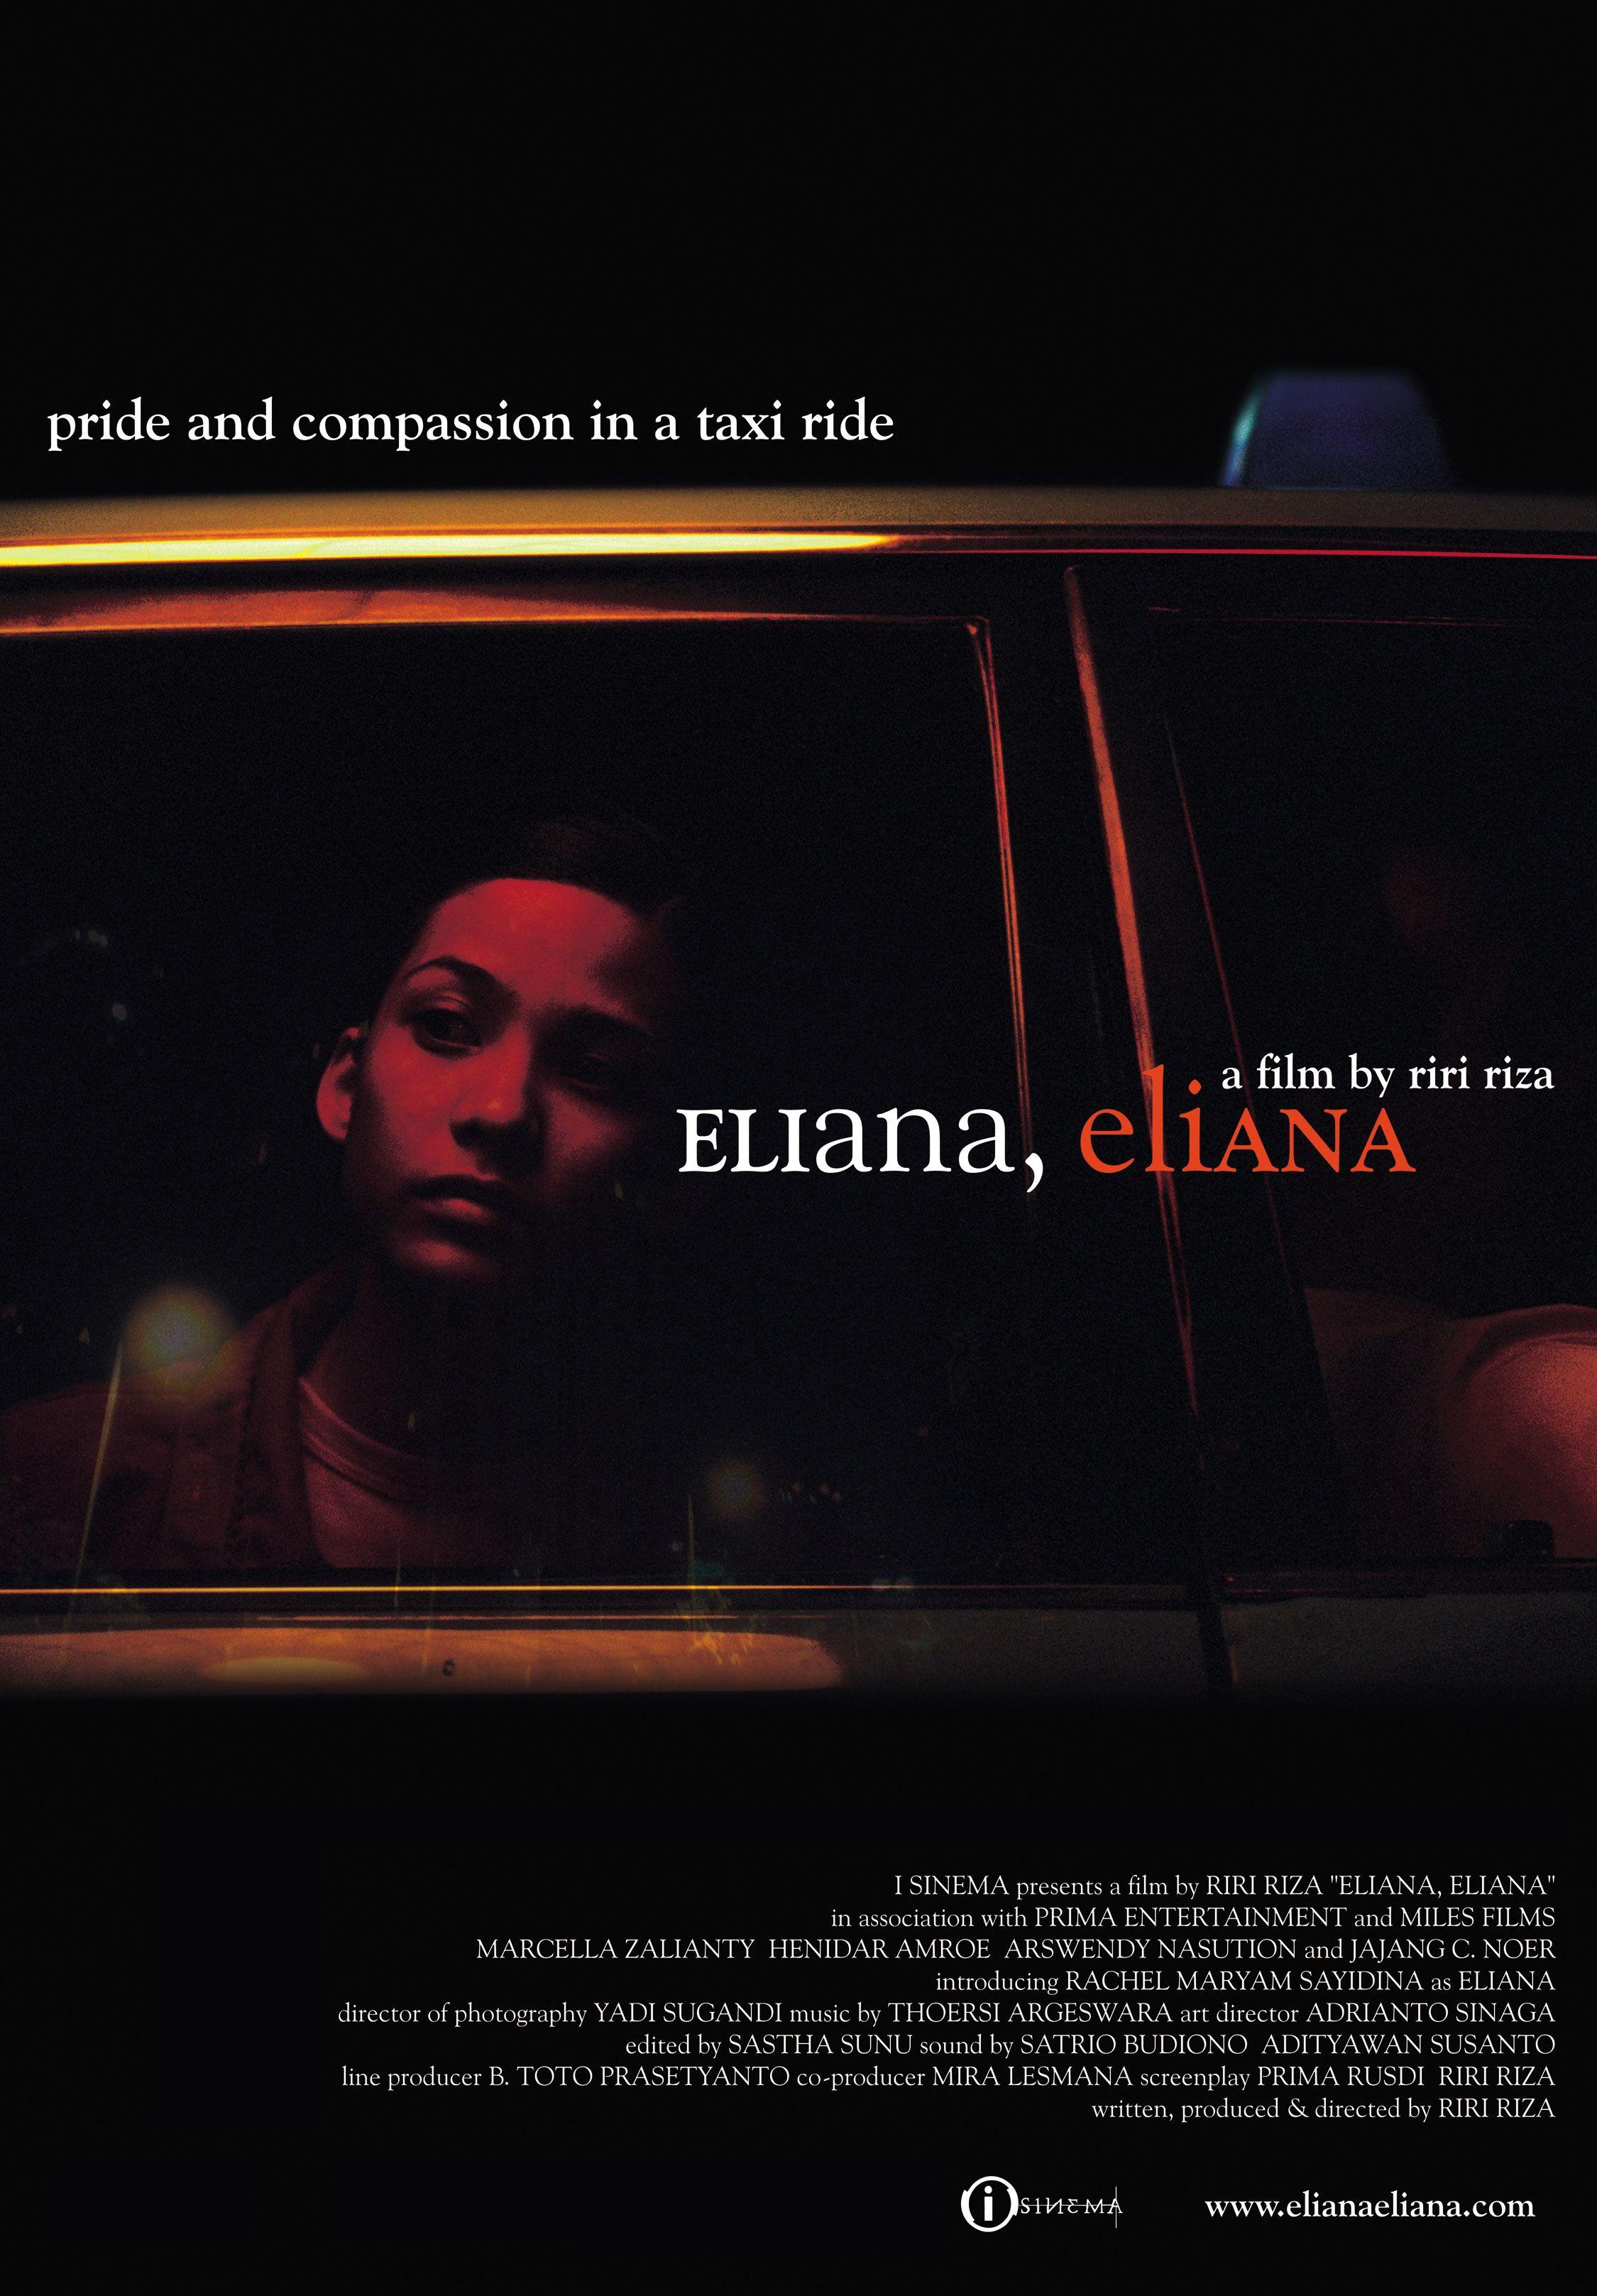 2002 • Eliana, Eliana (Riri Riza)